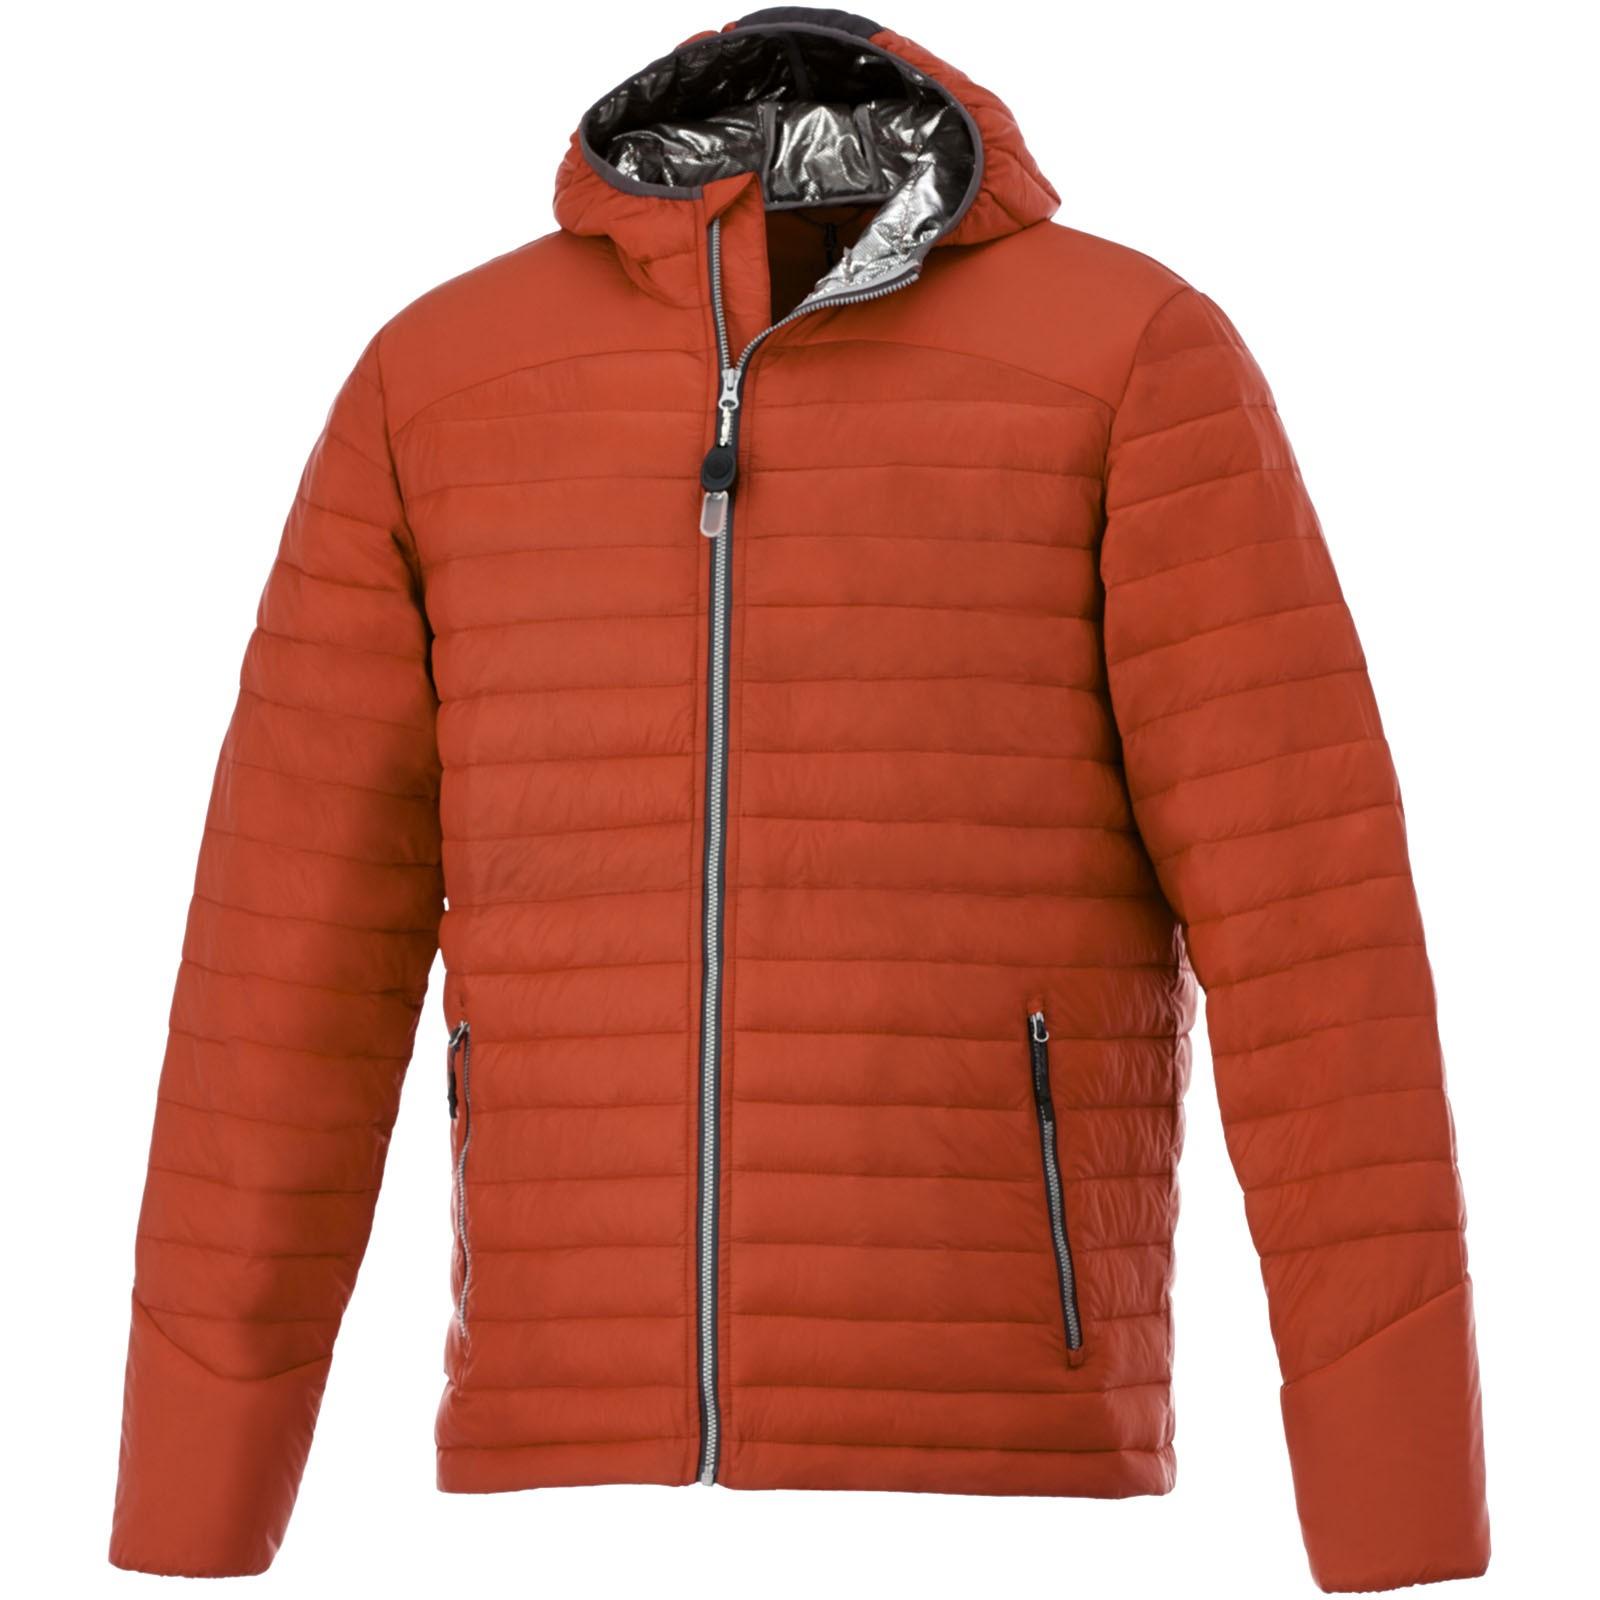 Silverton men's insulated packable jacket - Orange / L